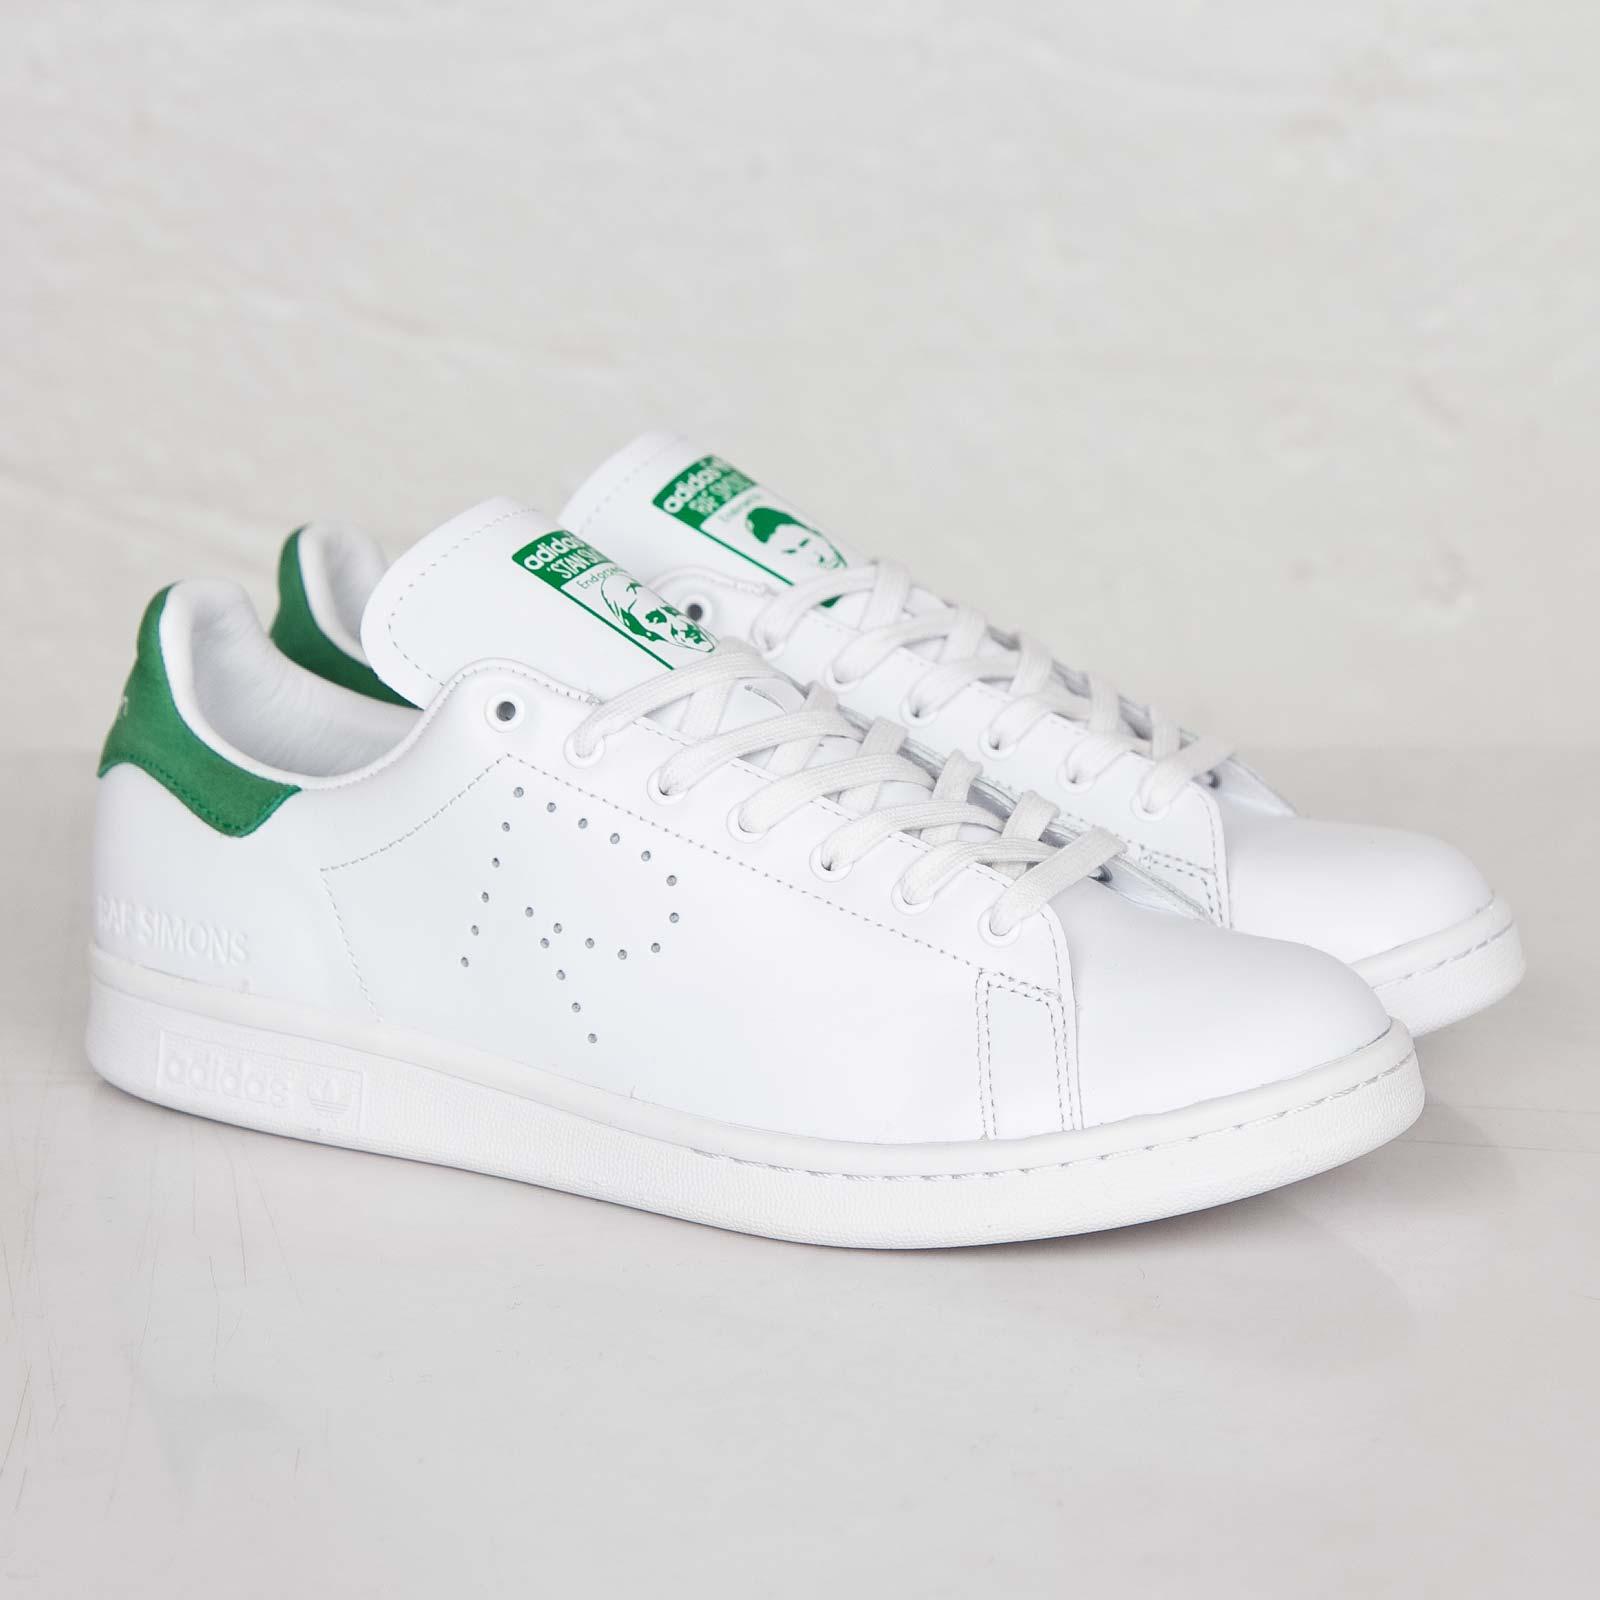 purchase cheap 1190a 68c2b adidas Raf Simons Stan Smith - B24051 - Sneakersnstuff ...